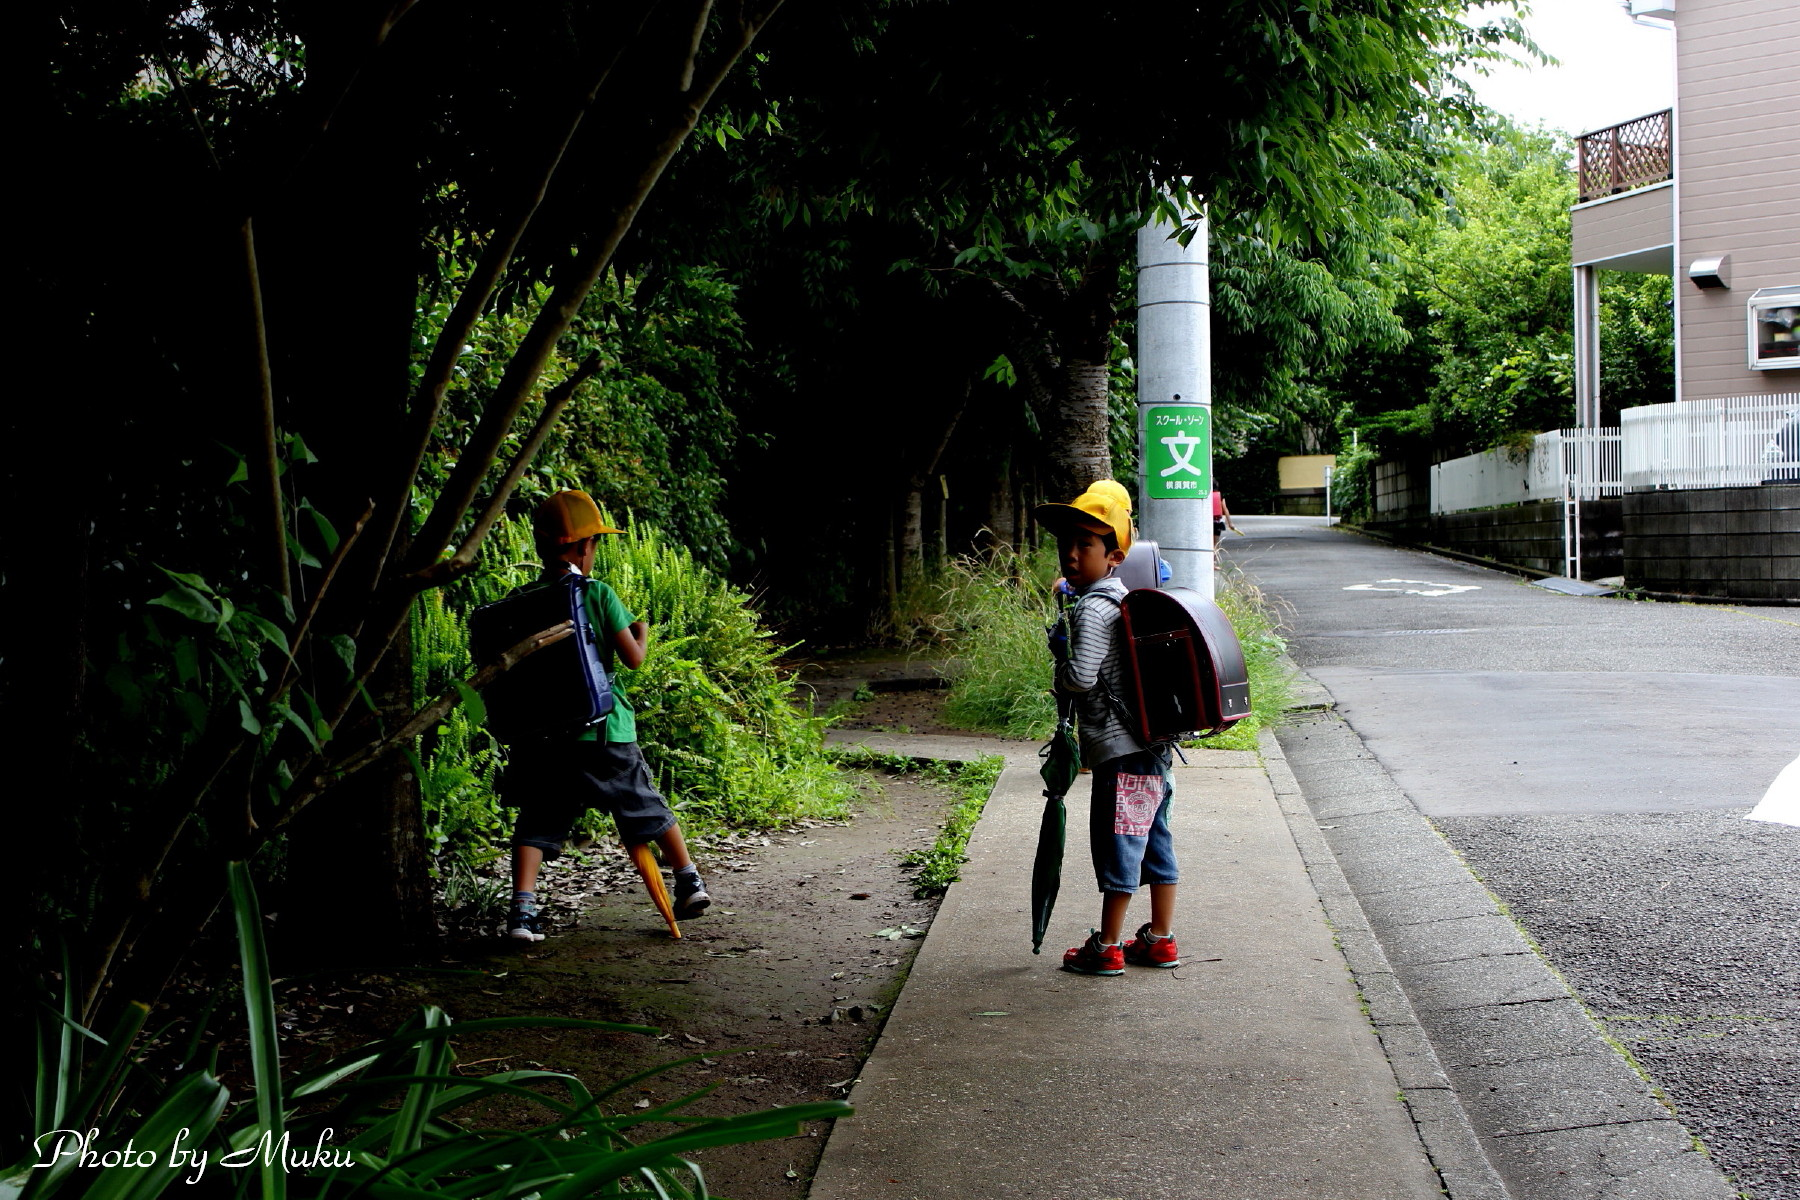 2014/06/12 雨上がり (散歩道:神奈川県横須賀市)